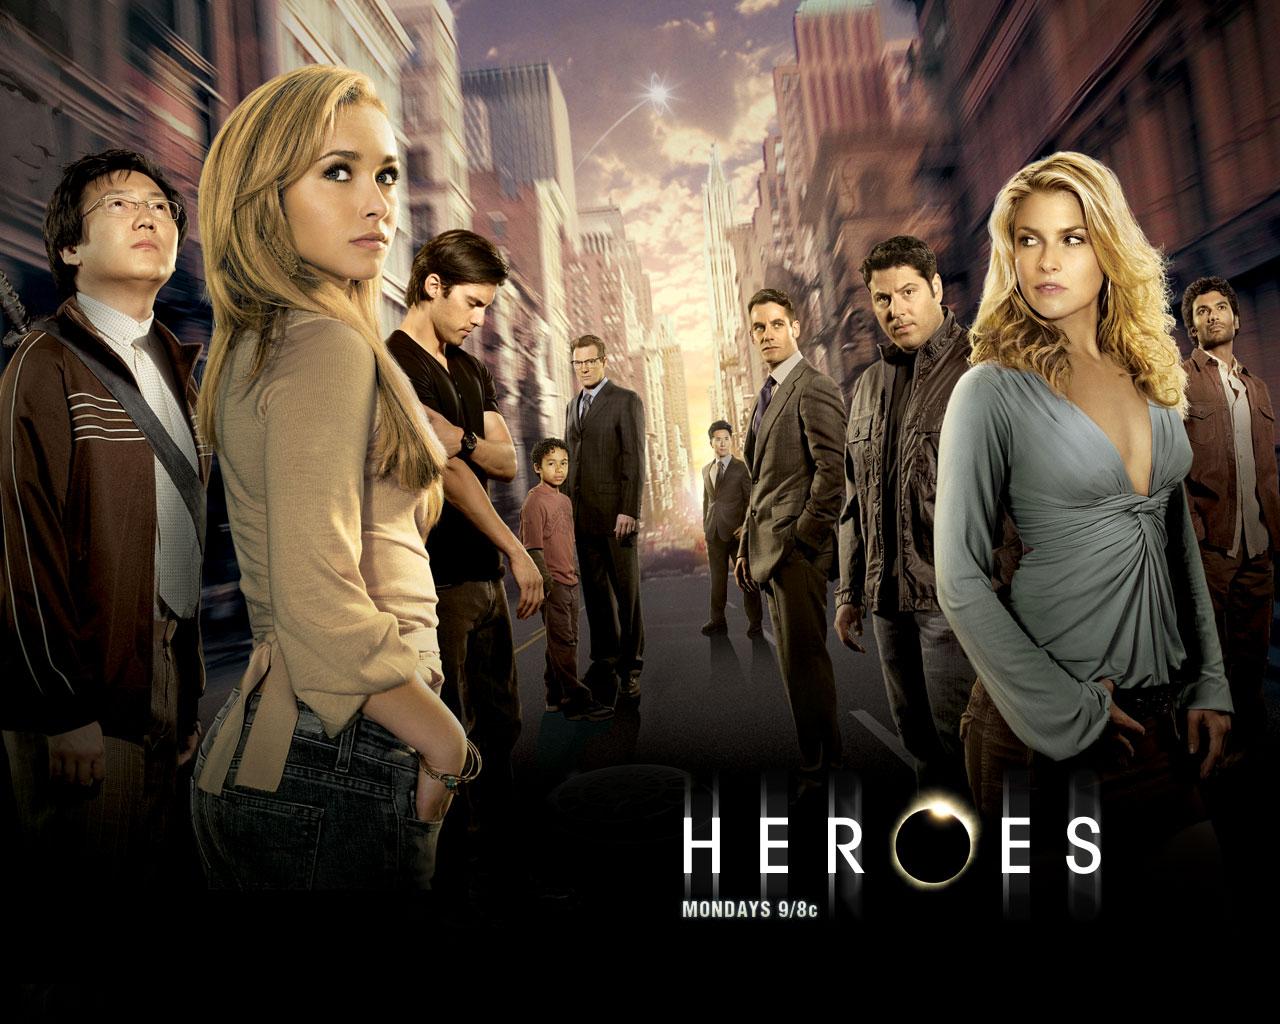 http://4.bp.blogspot.com/_MxOVrLX5TvU/TQjJRpFSFBI/AAAAAAAAAHQ/5ypGF6Jzw-c/s1600/Heroes-TV-Wallpaper.jpg